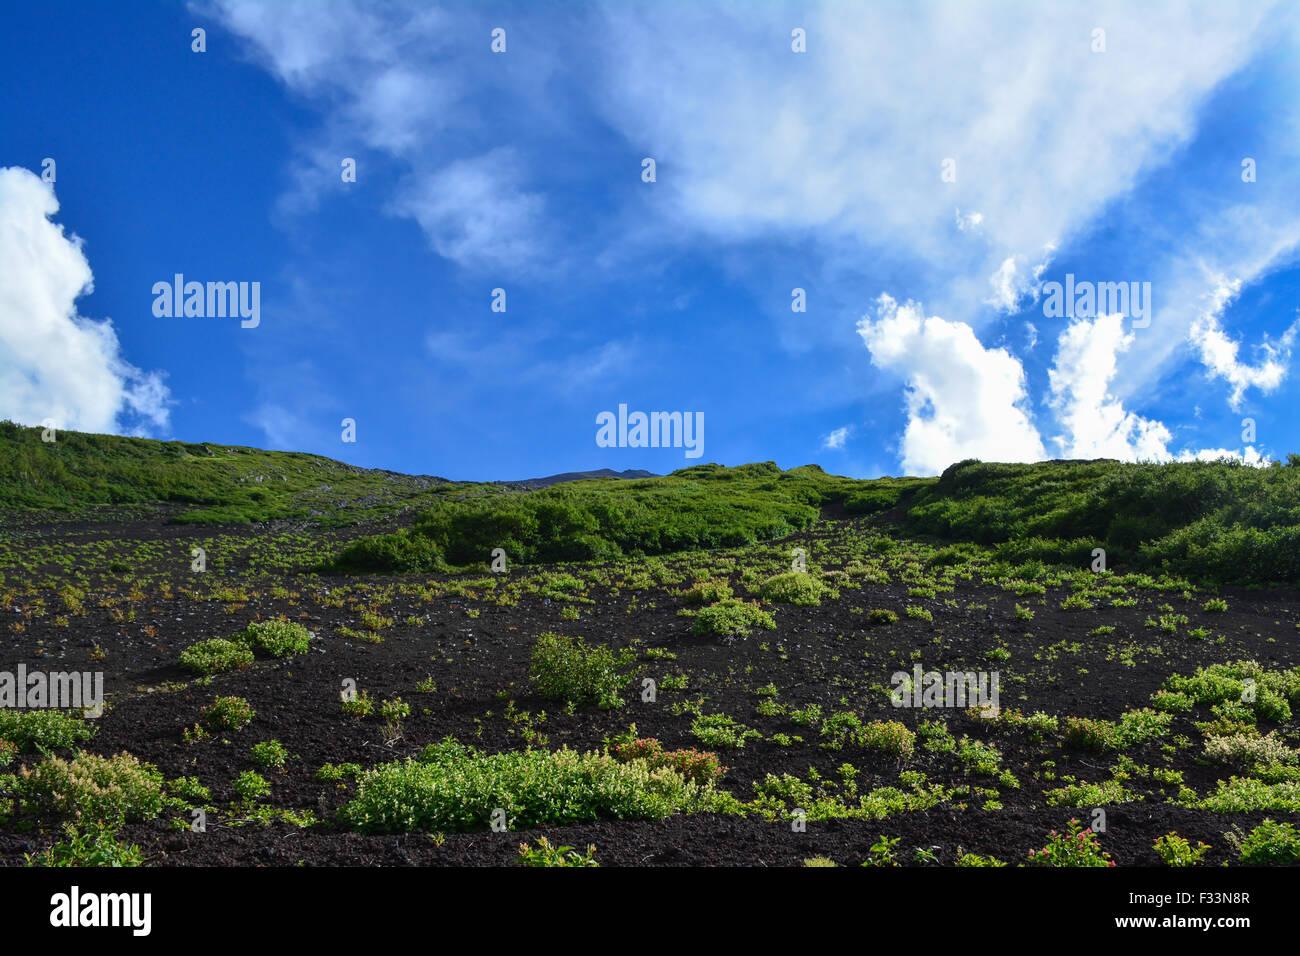 Mount Fuji slope, foothill view. Japan. - Stock Image